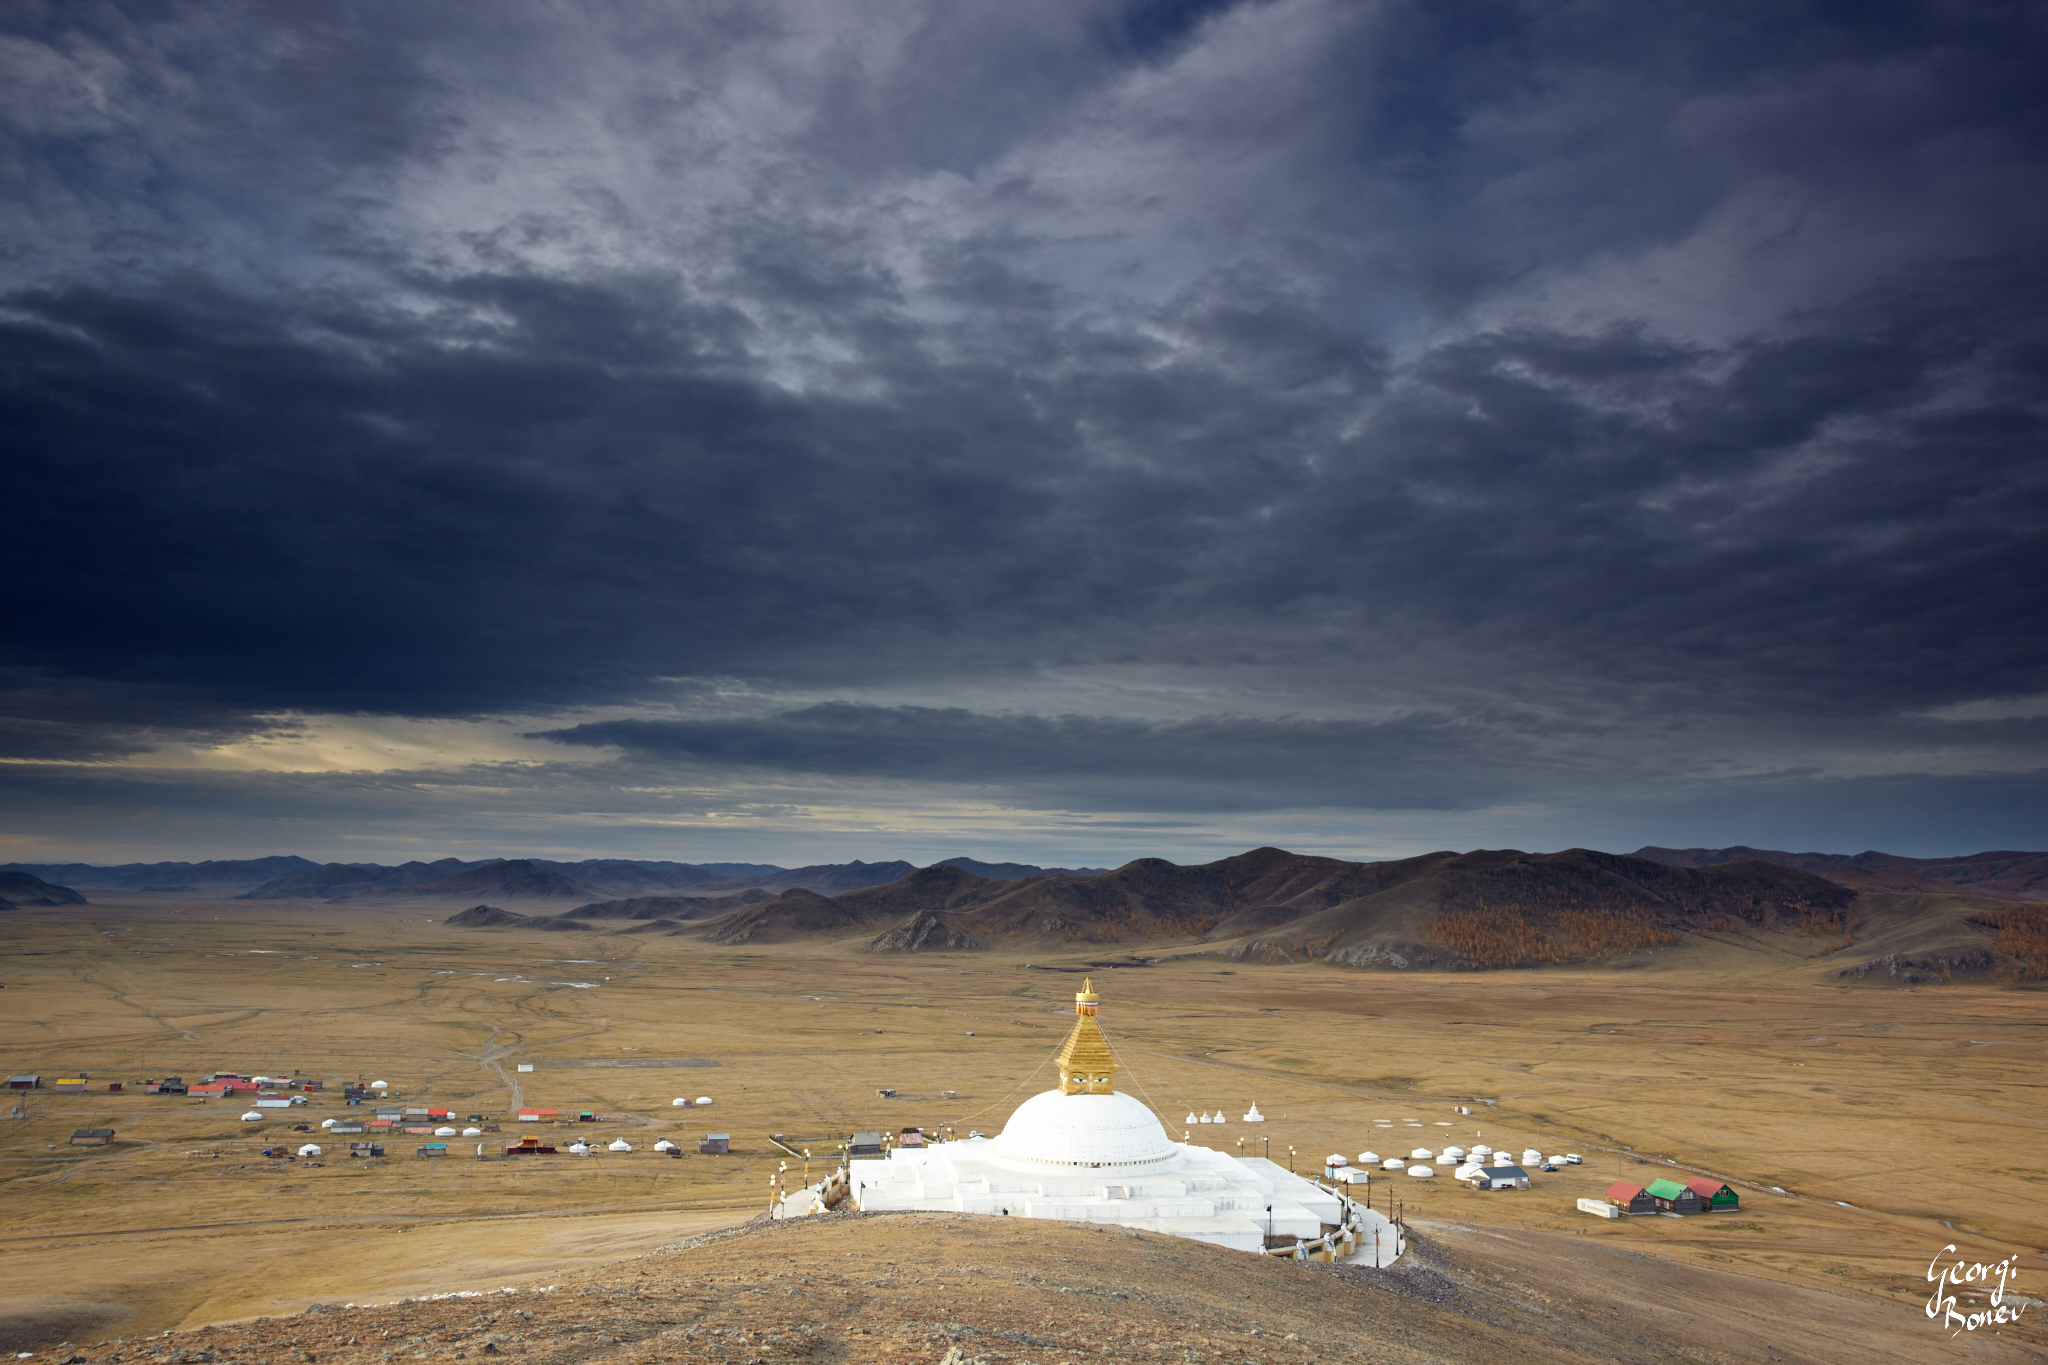 Stupa of Amarbayasgalant Khiit Monastery